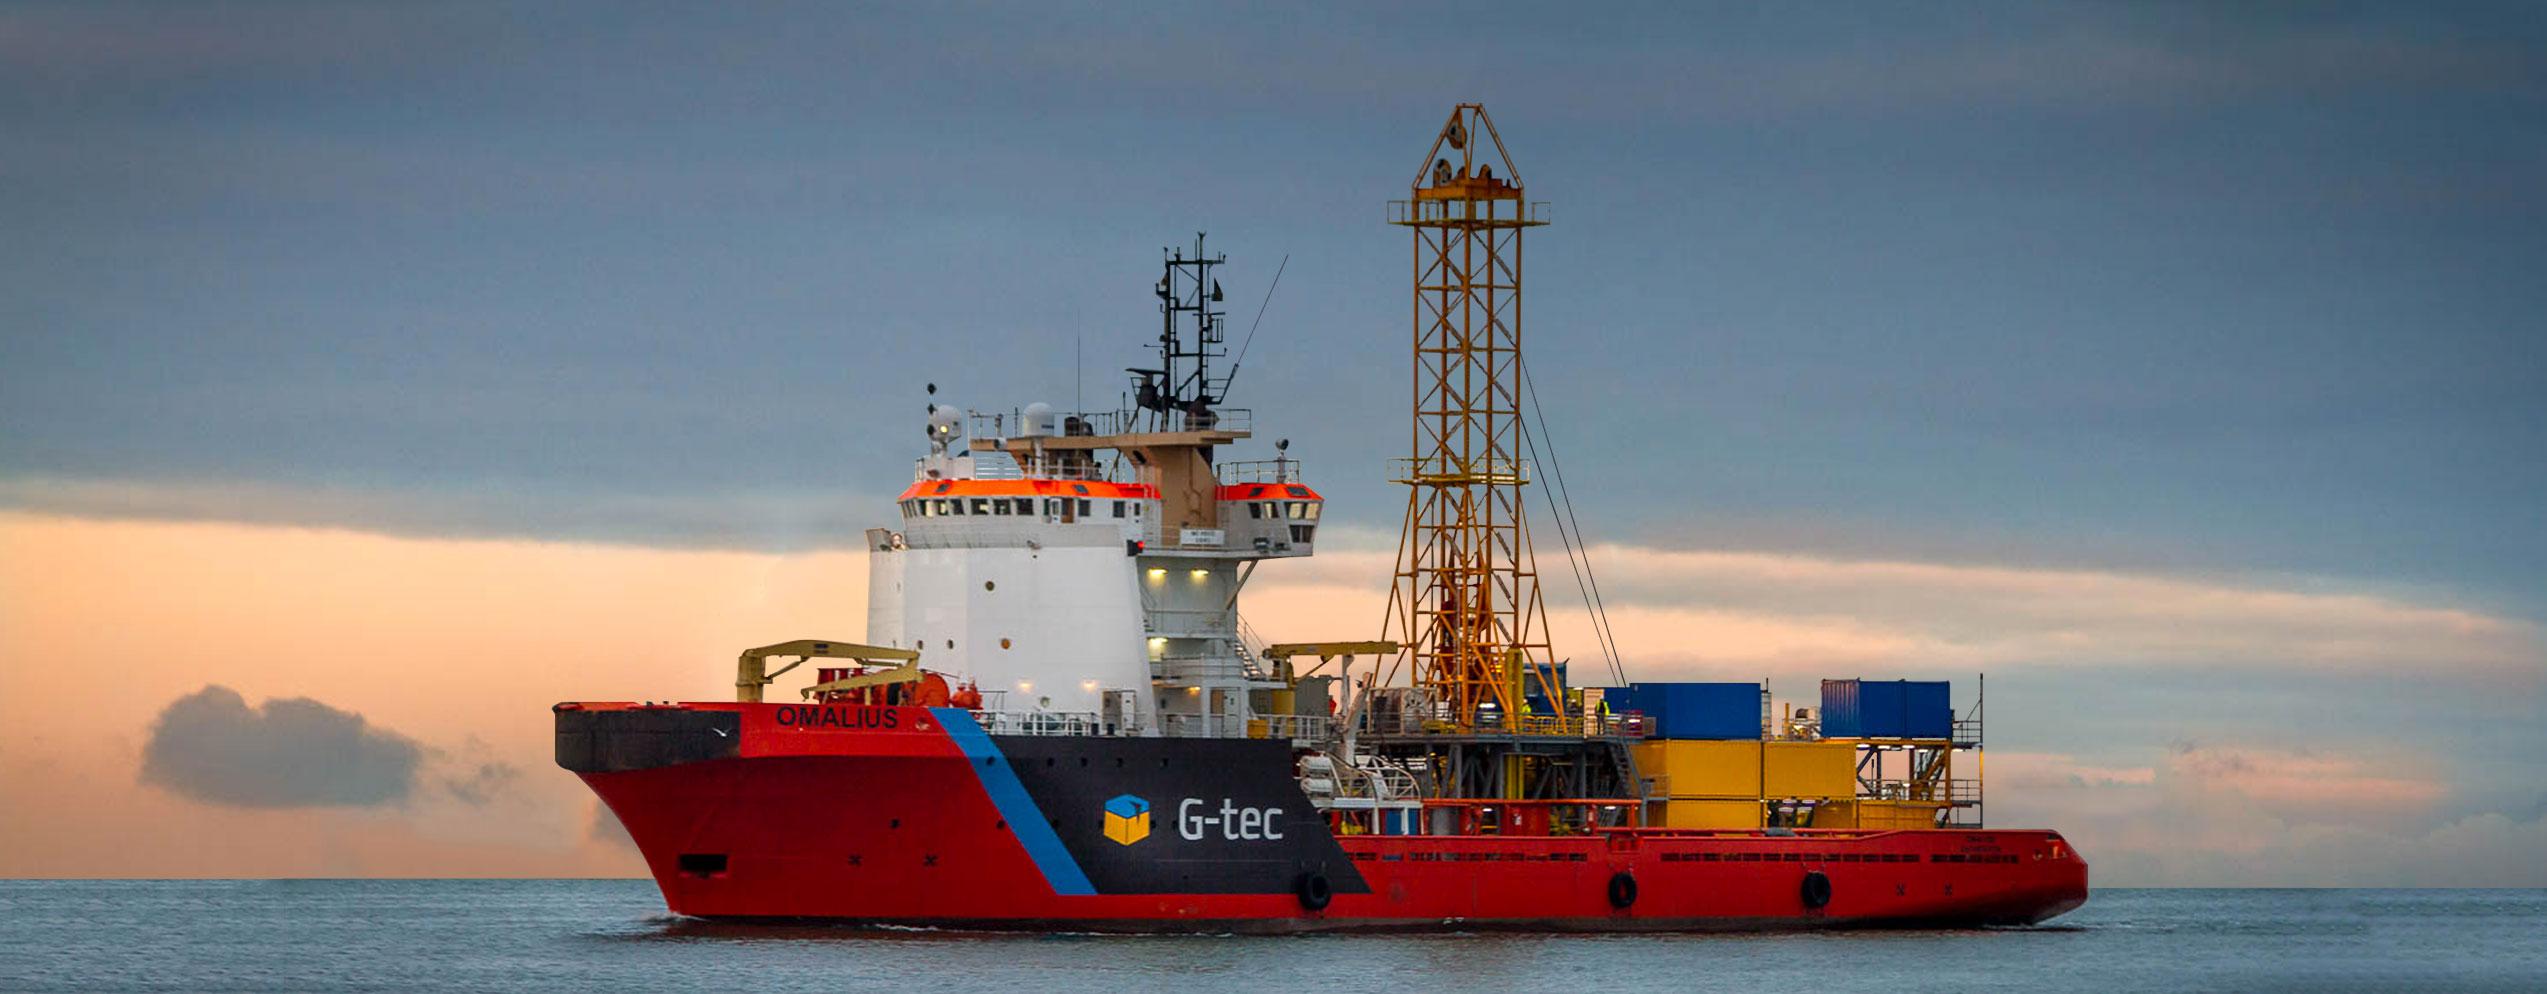 Omalius Le Havre test Copy